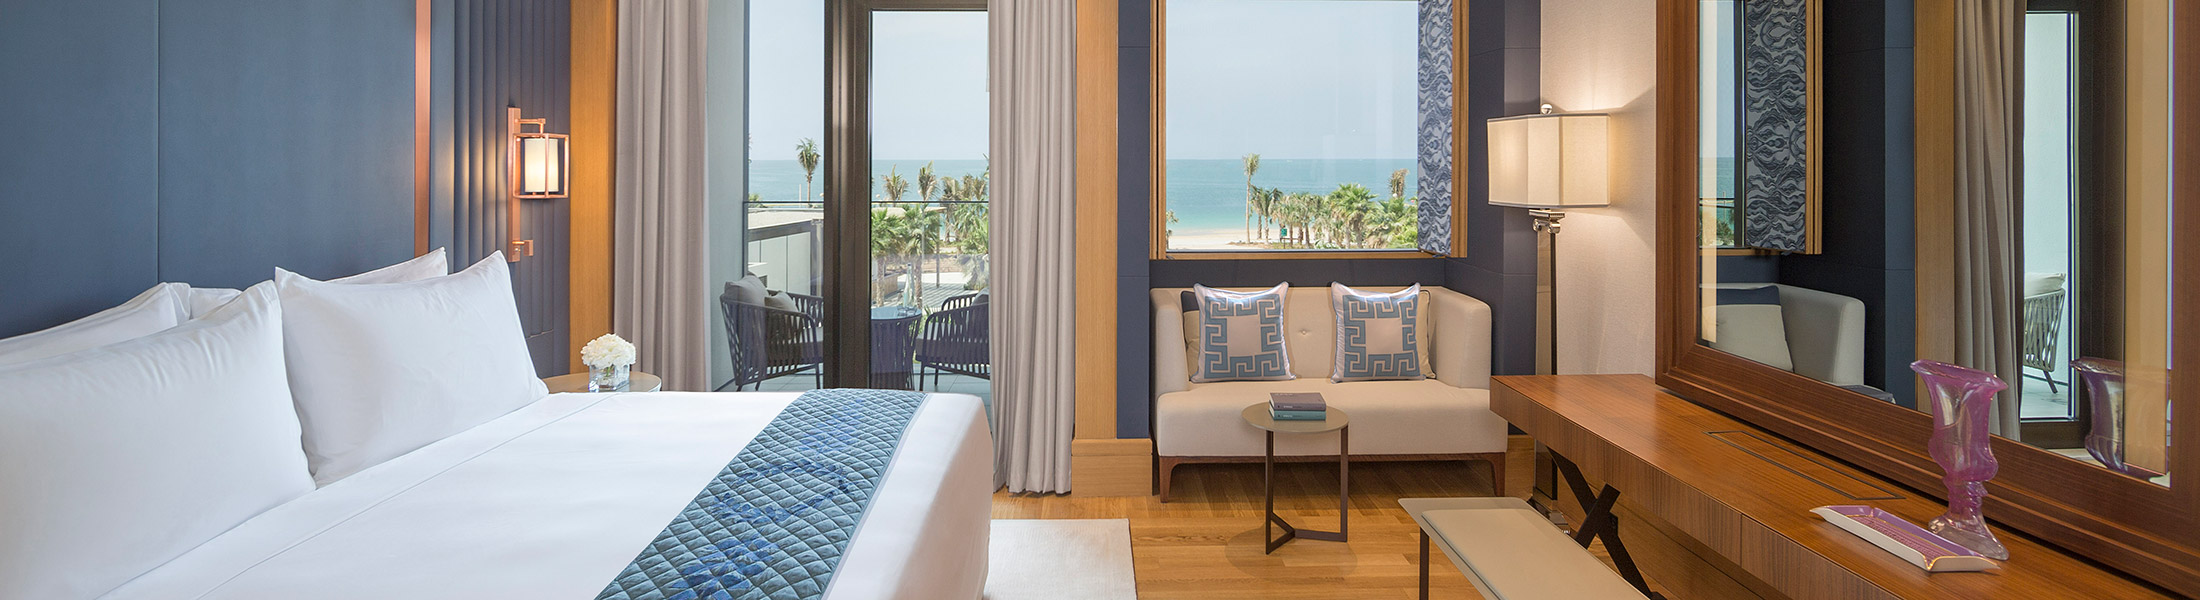 Bedroom of the Resort Deluxe Room at Caesars Resort Bluewaters